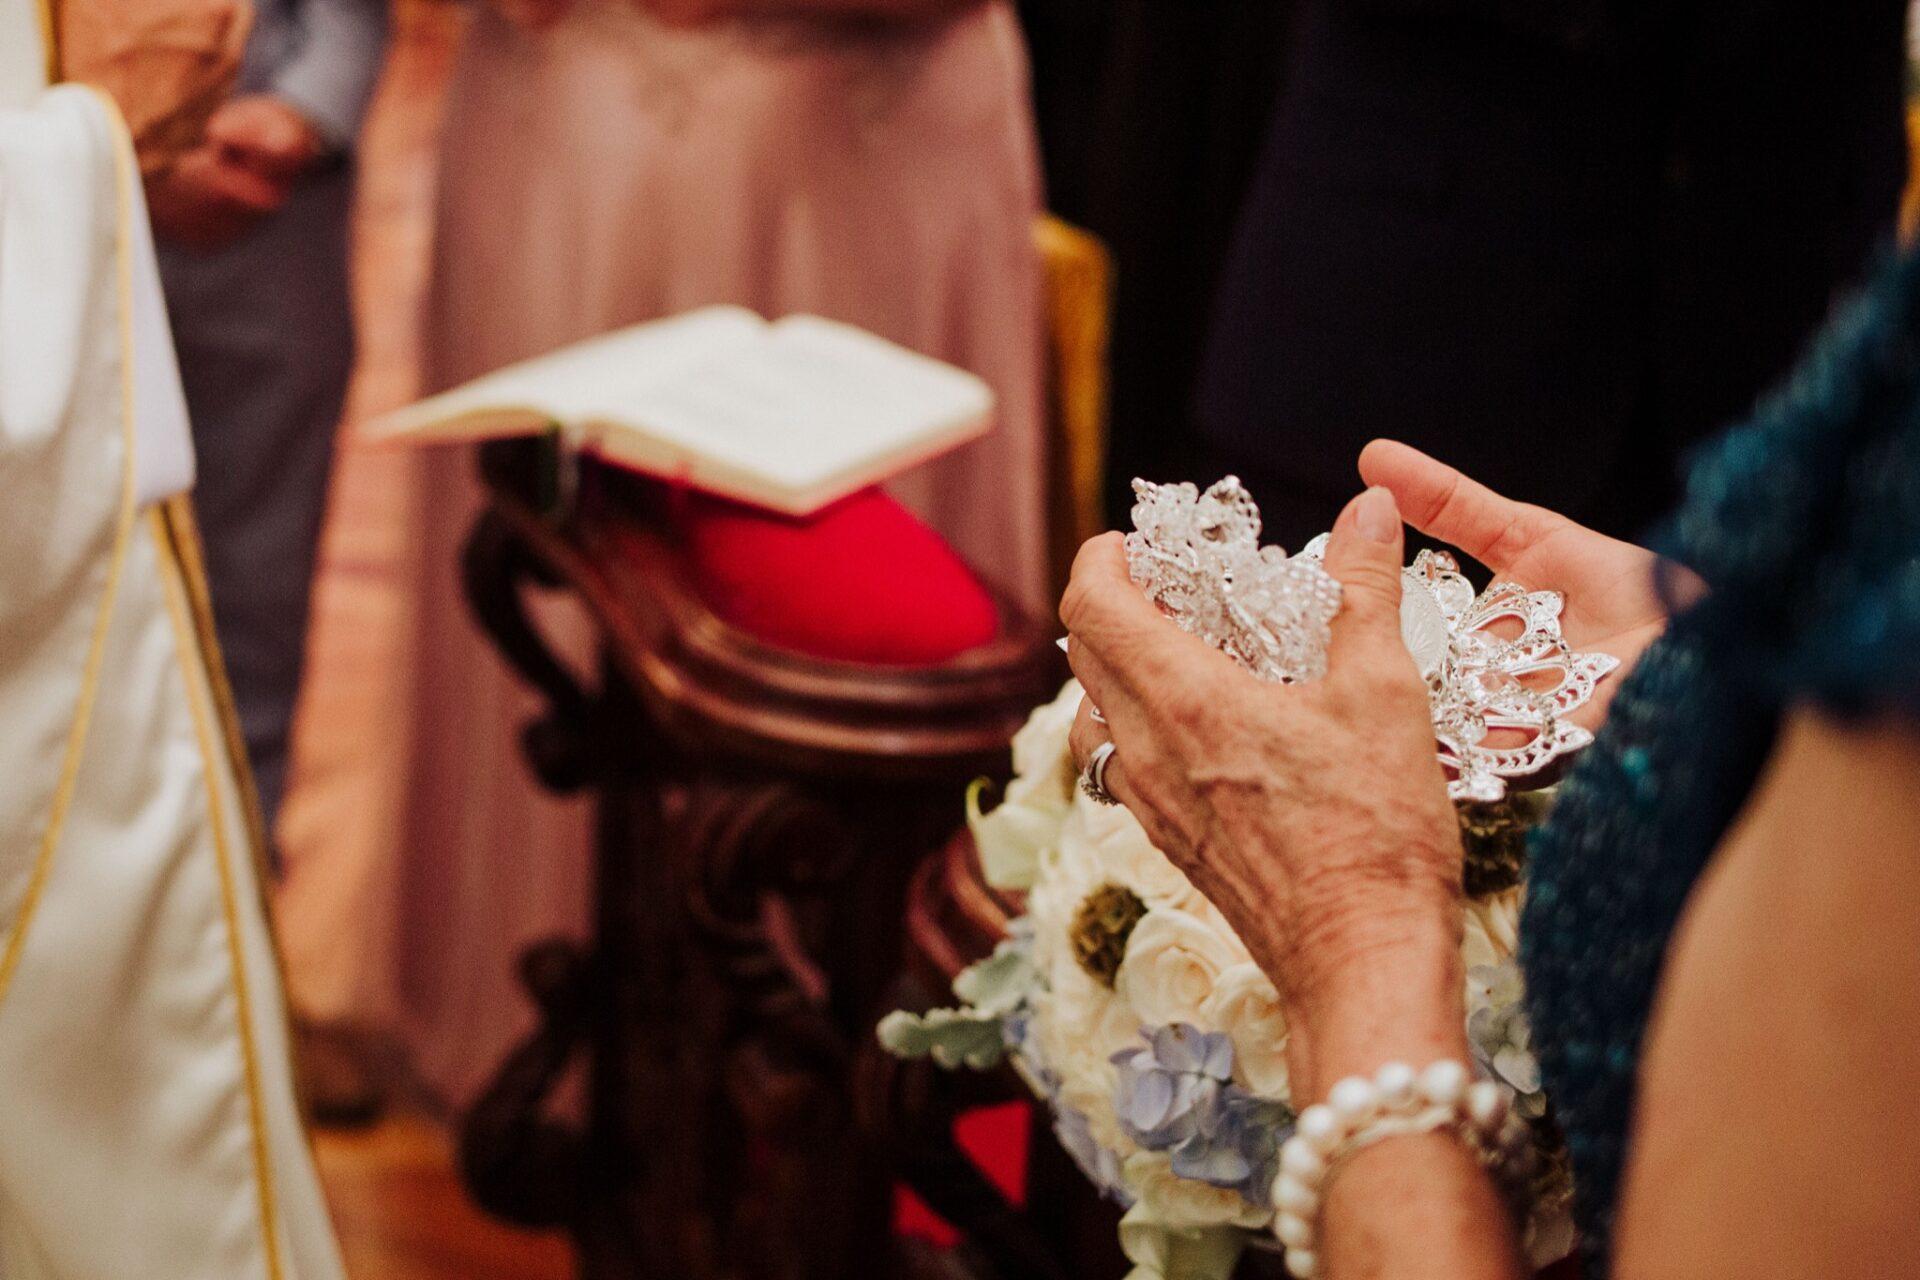 javier_noriega_fotografo_bodas_centro_platero_zacatecas_wedding_photographer12